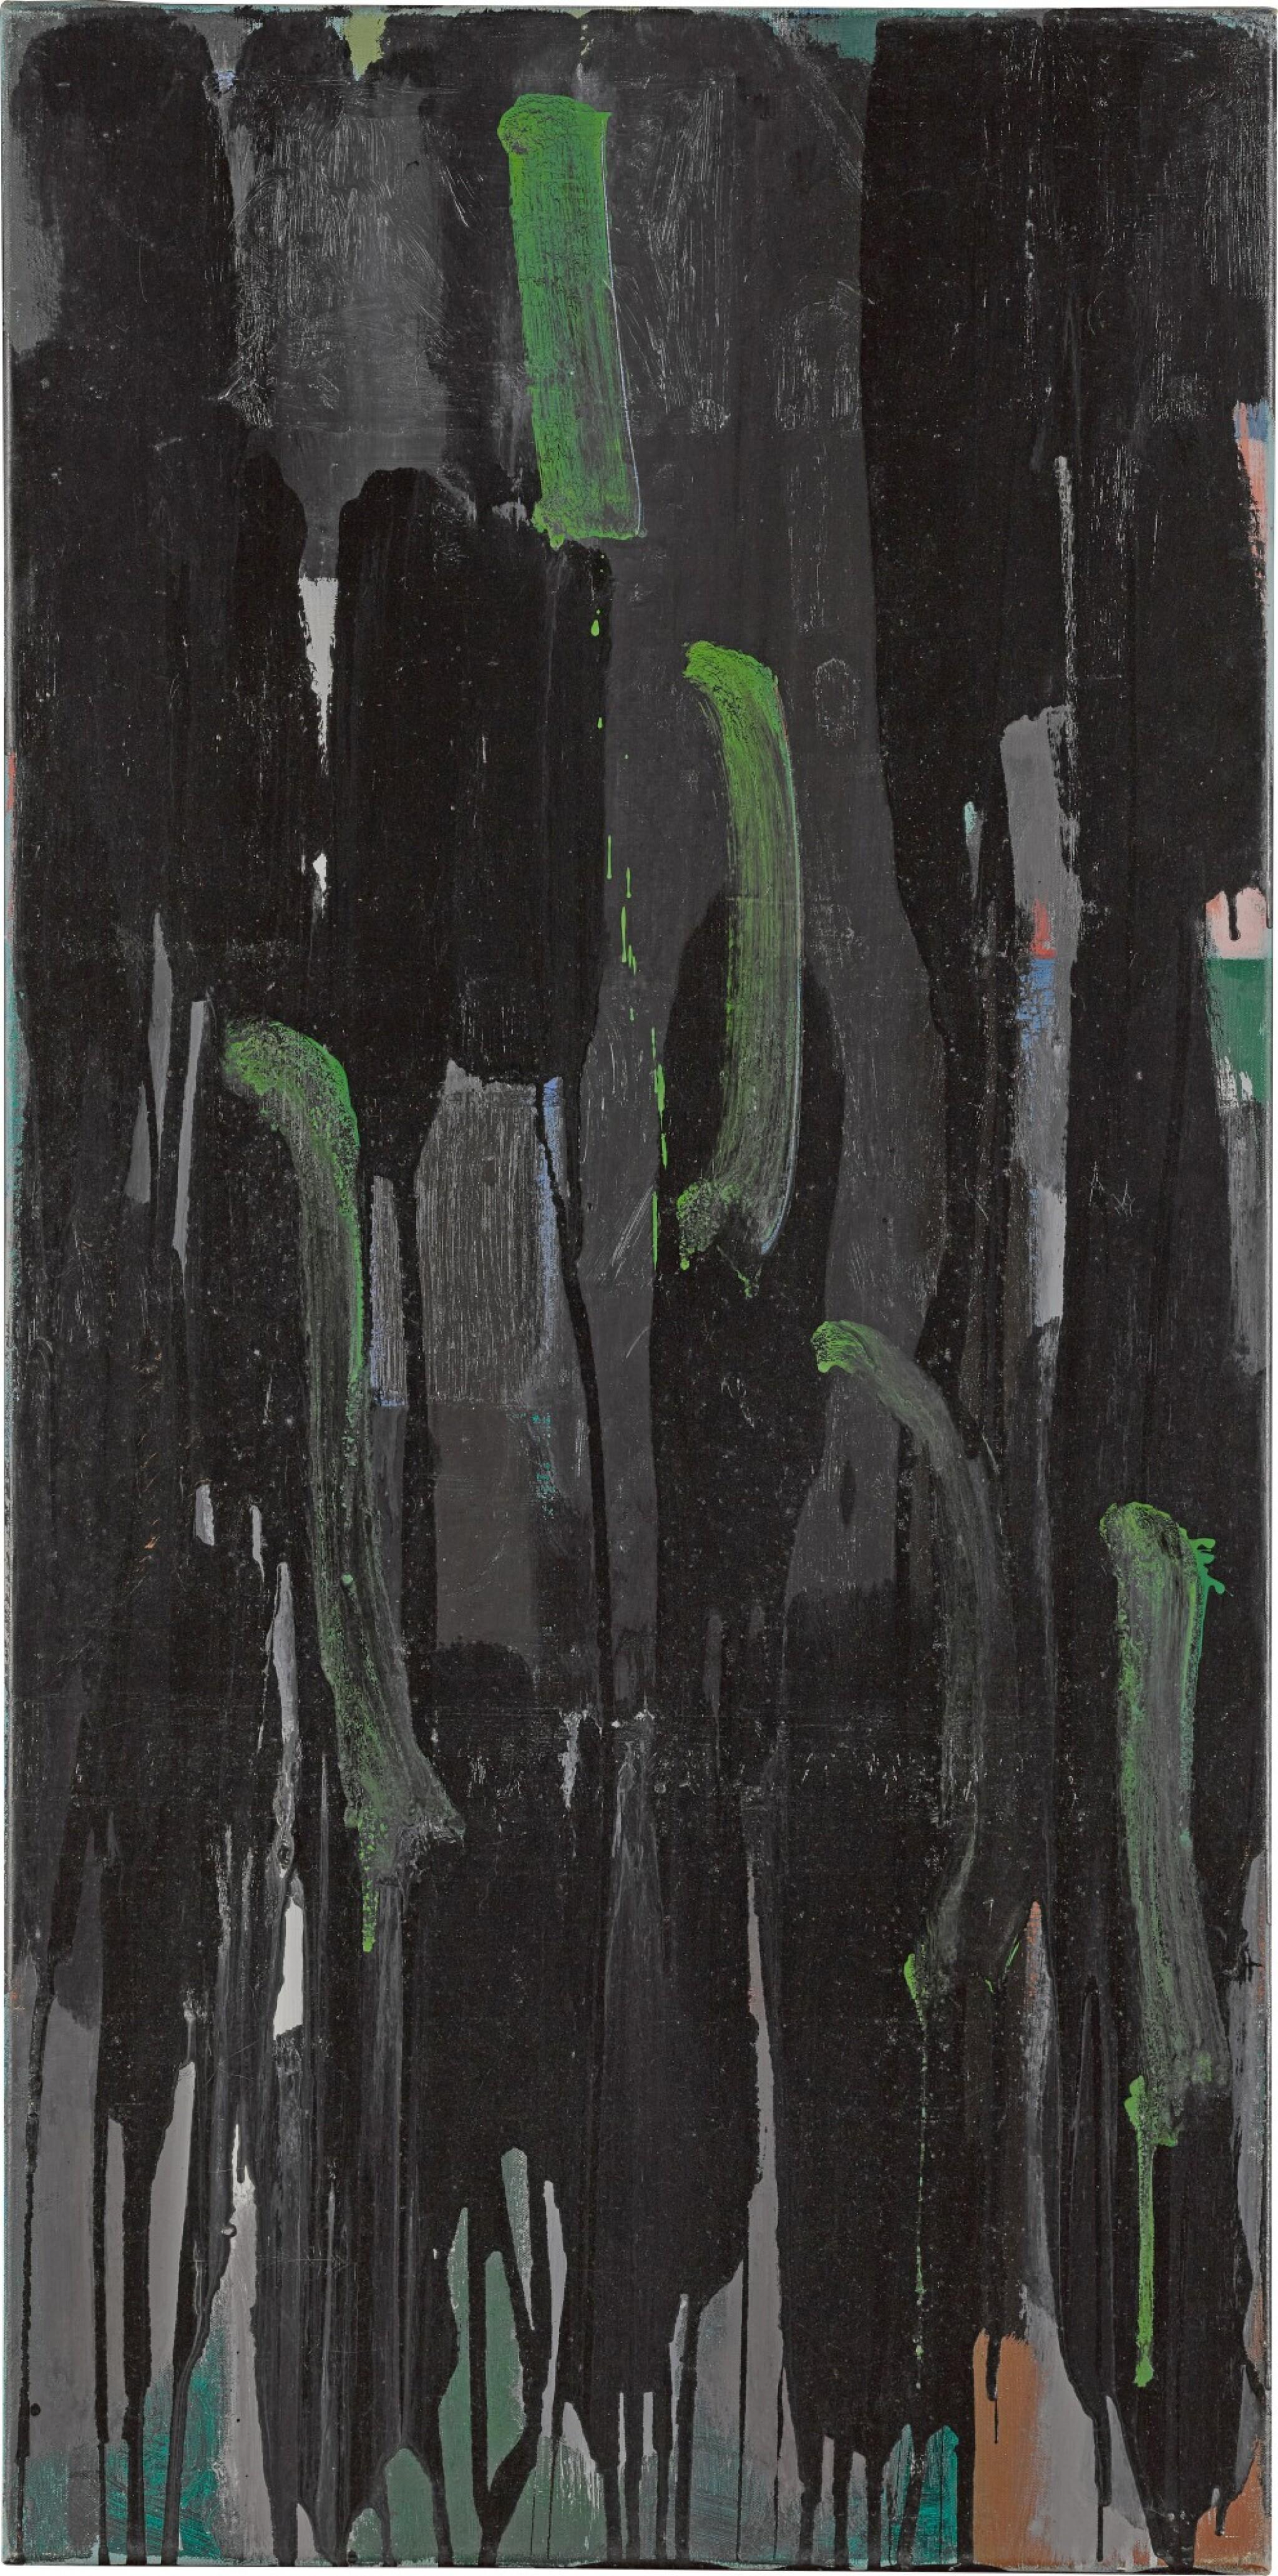 GREEN ON BLACKS : 1956